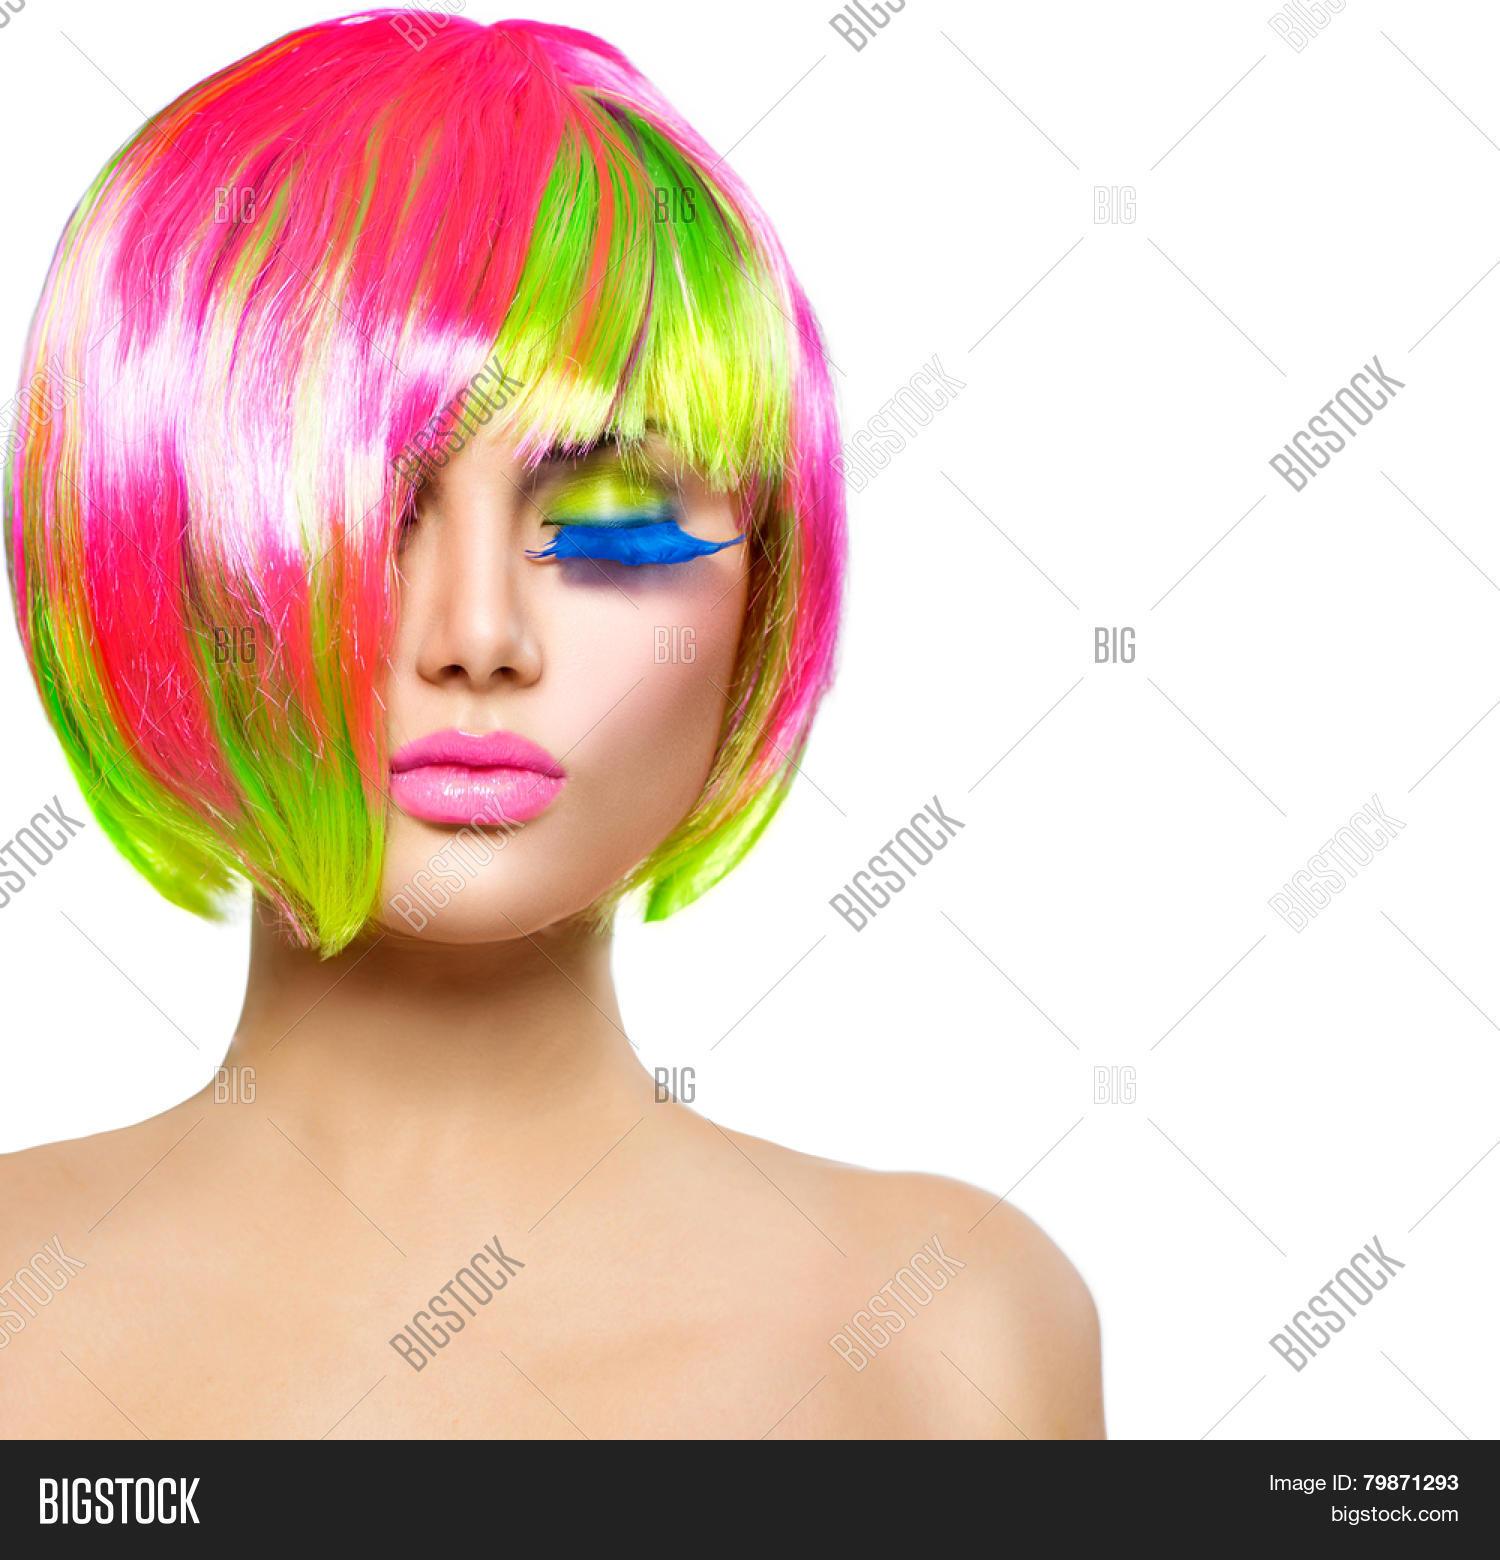 Beauty Fashion Model Image Photo Free Trial Bigstock